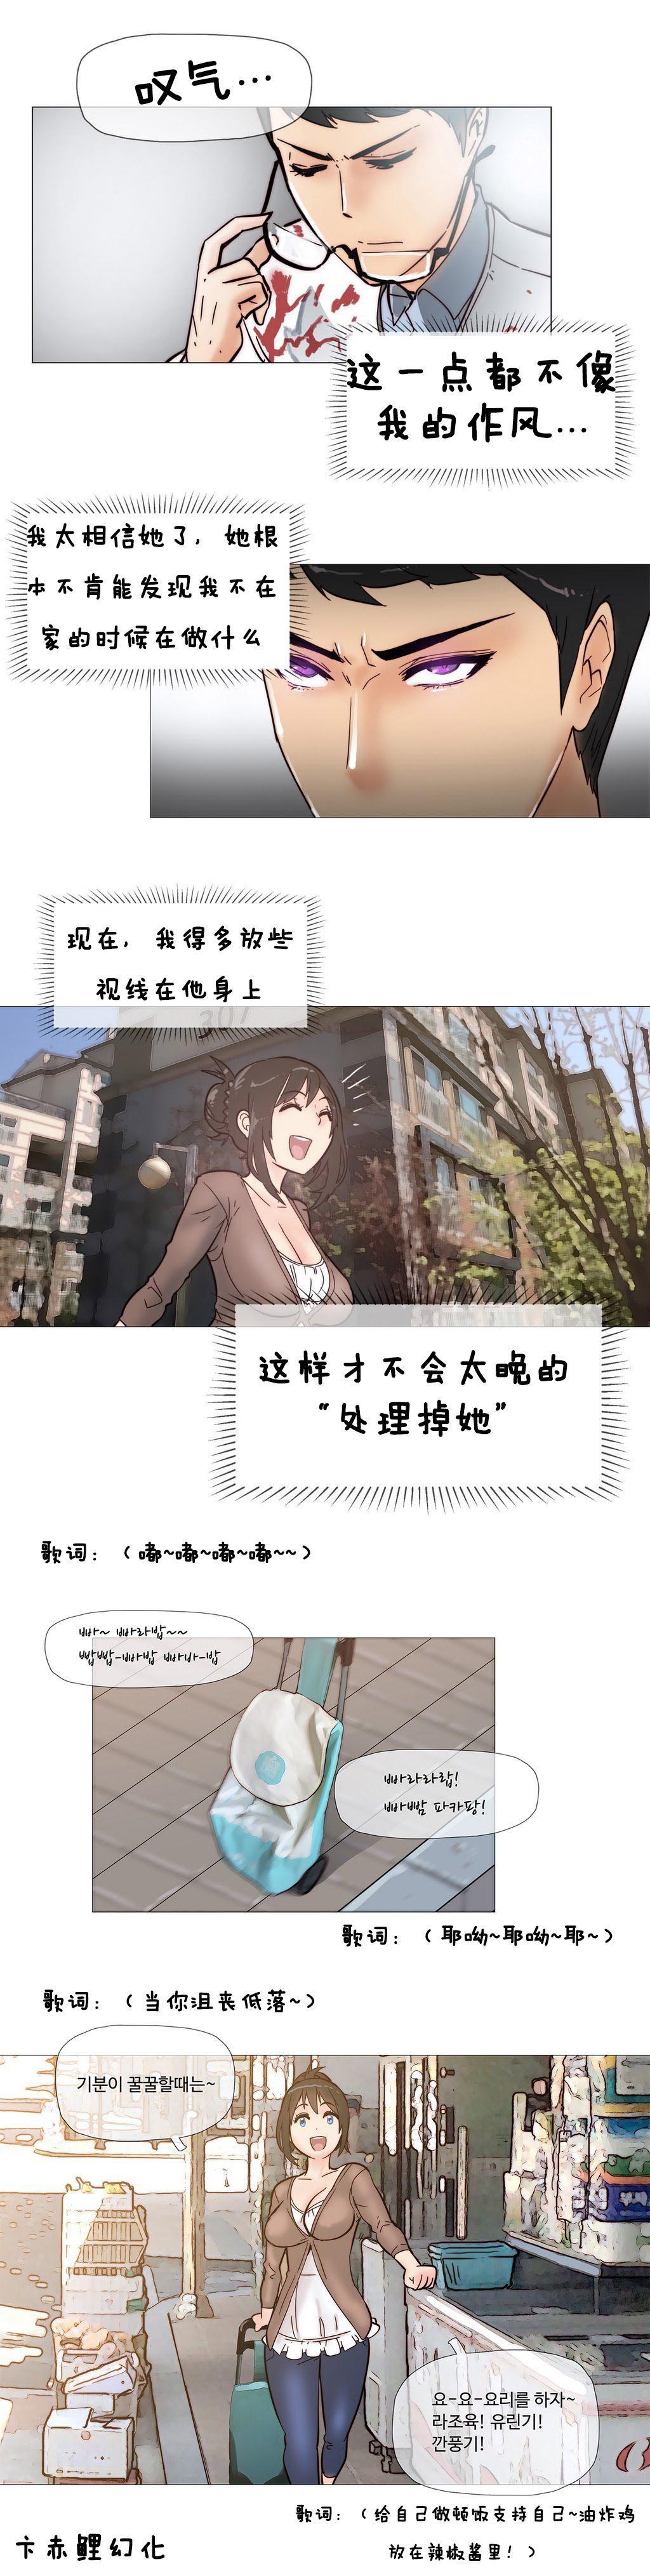 HouseHold Affairs 【卞赤鲤汉化】1~15话 60